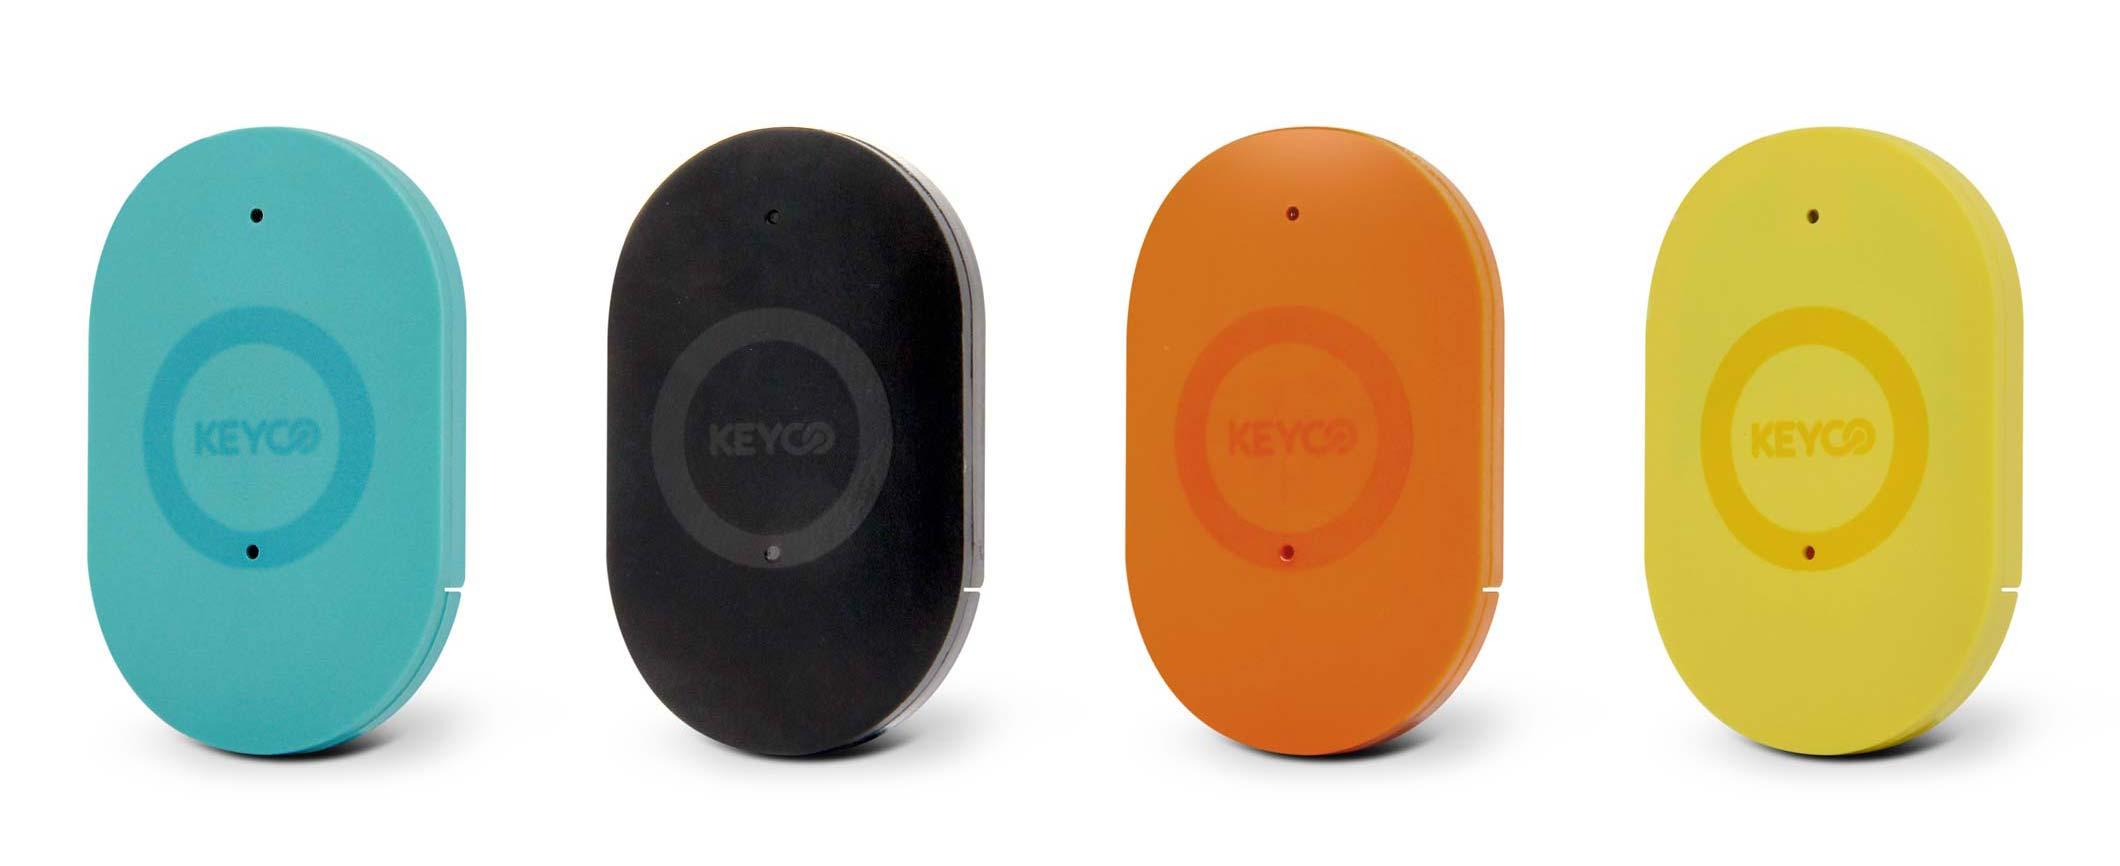 keyco mini